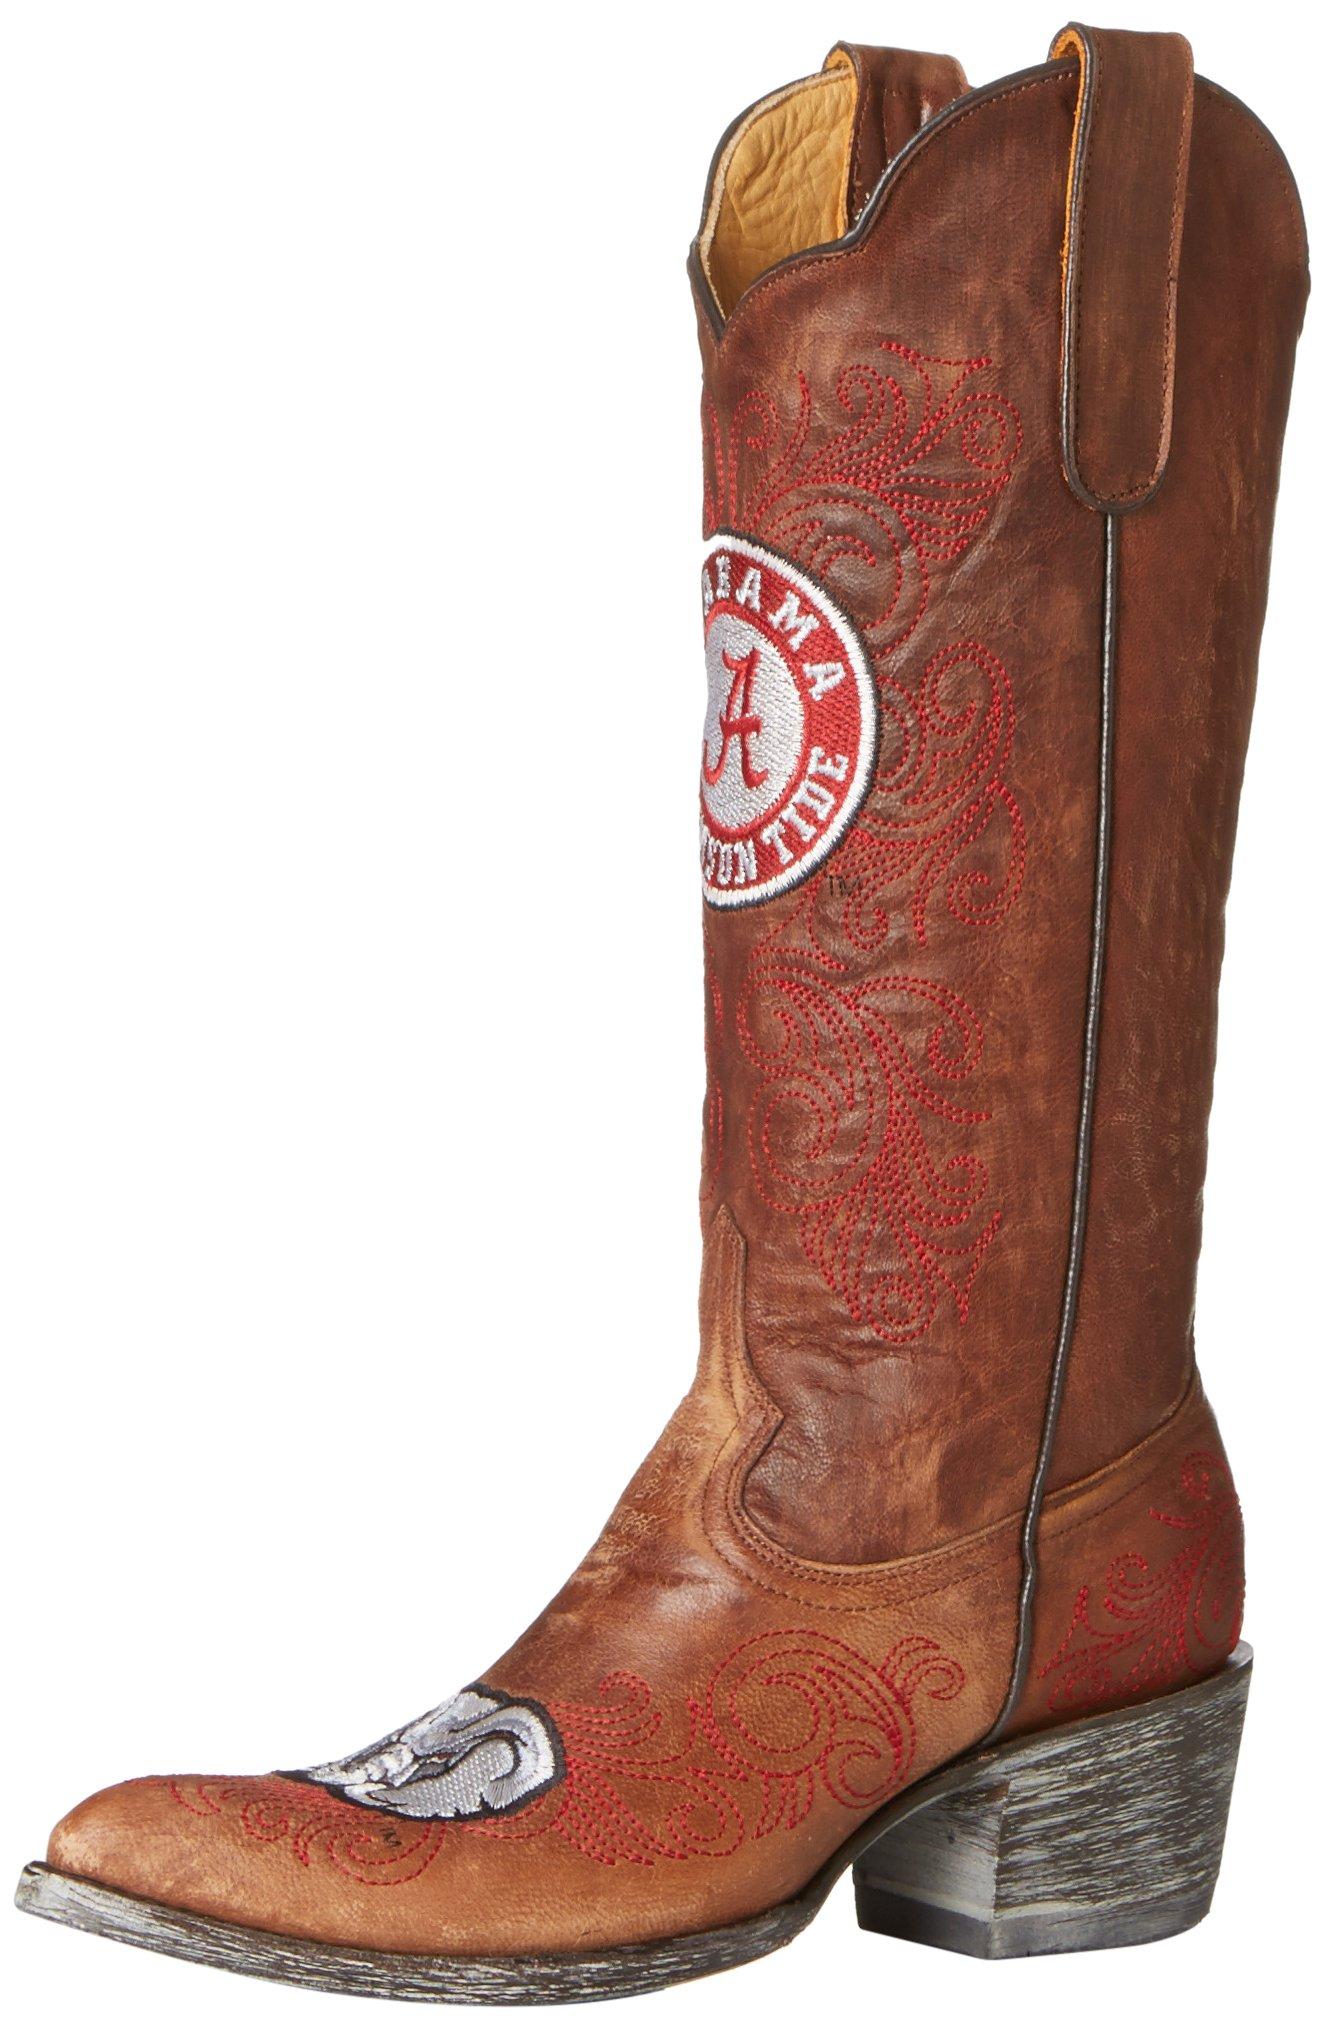 NCAA Alabama Crimson Tide Women's 13-Inch Gameday Boots, Brass, 7.5 B (M) US